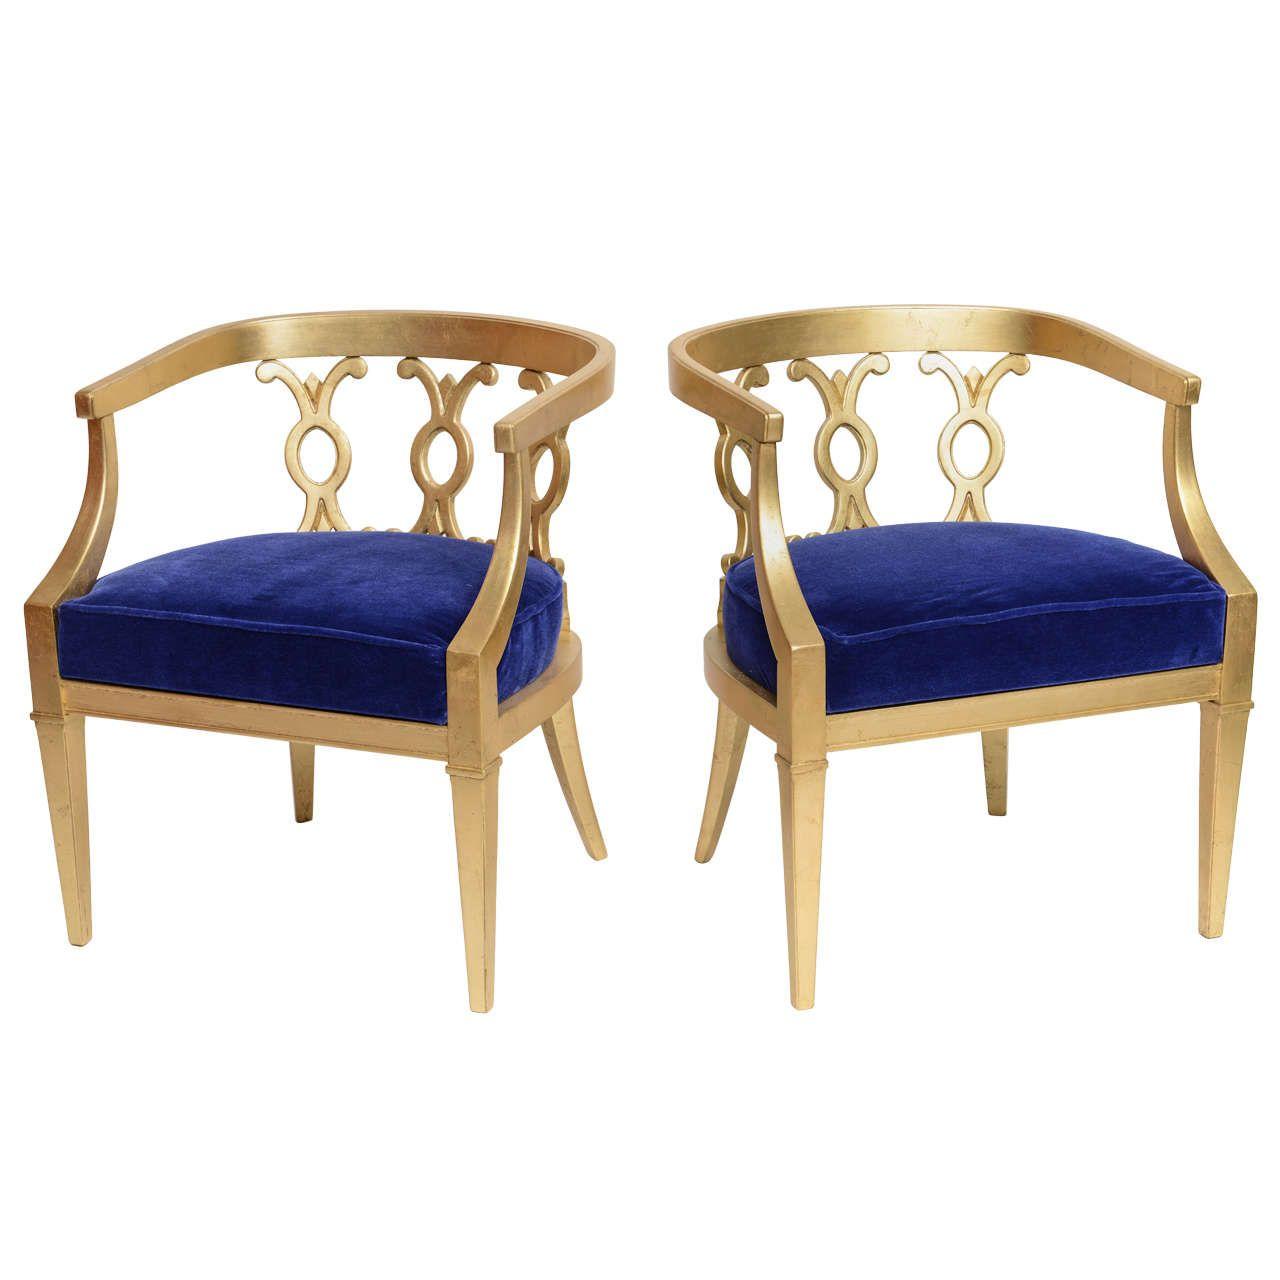 Pair Of Vintage Dorothy Draper Attribution Hollywood Regency Chairs